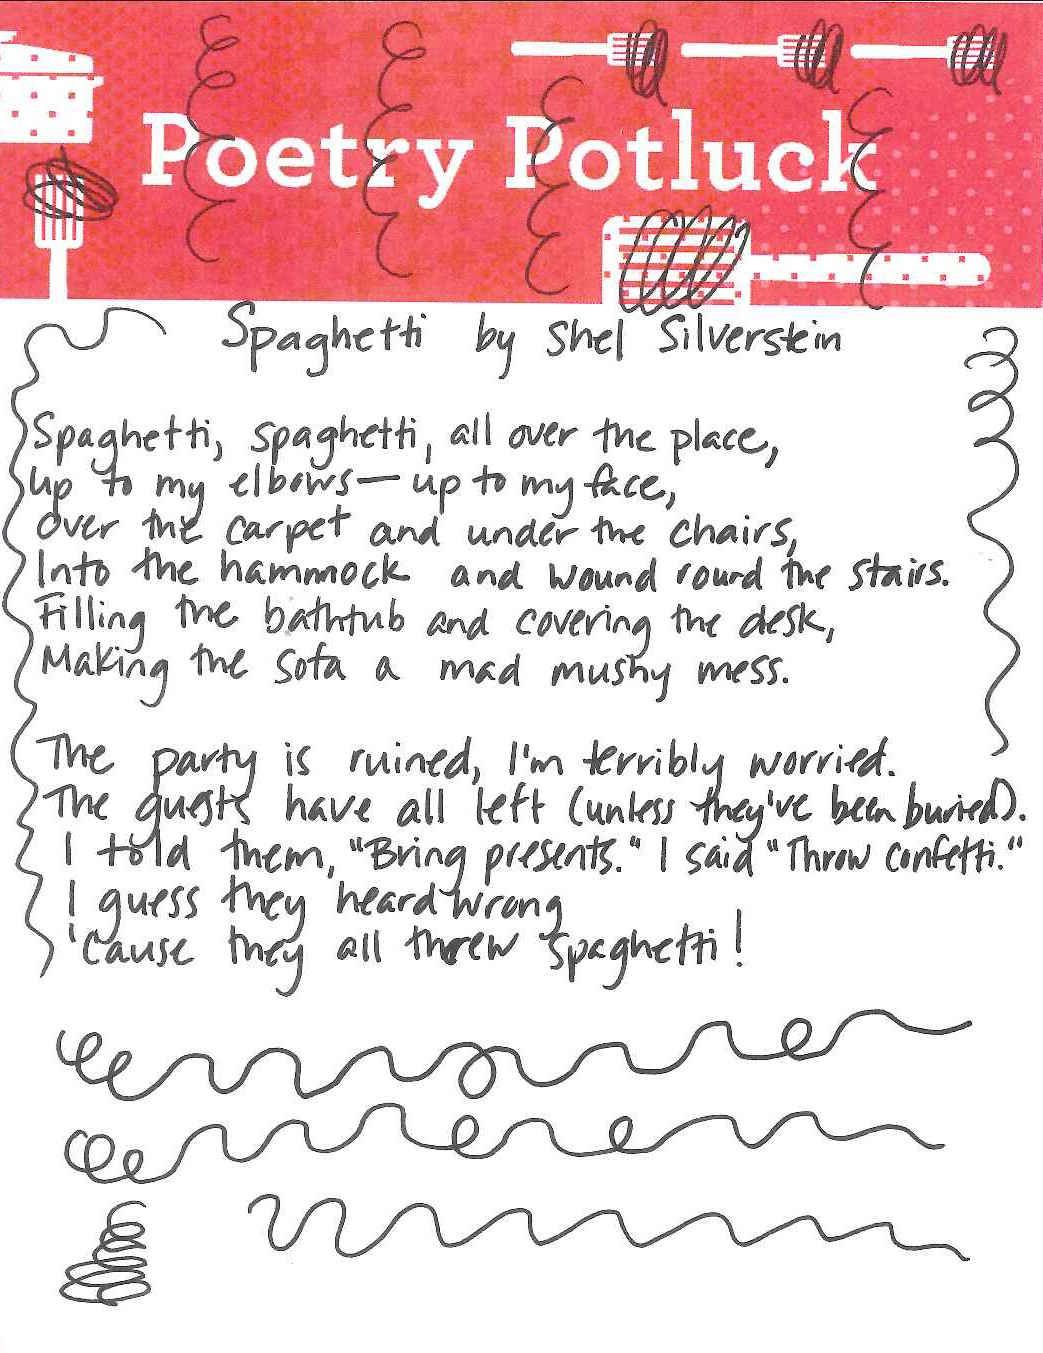 Poetry Potluck Spaghetti By Shel Silverstein